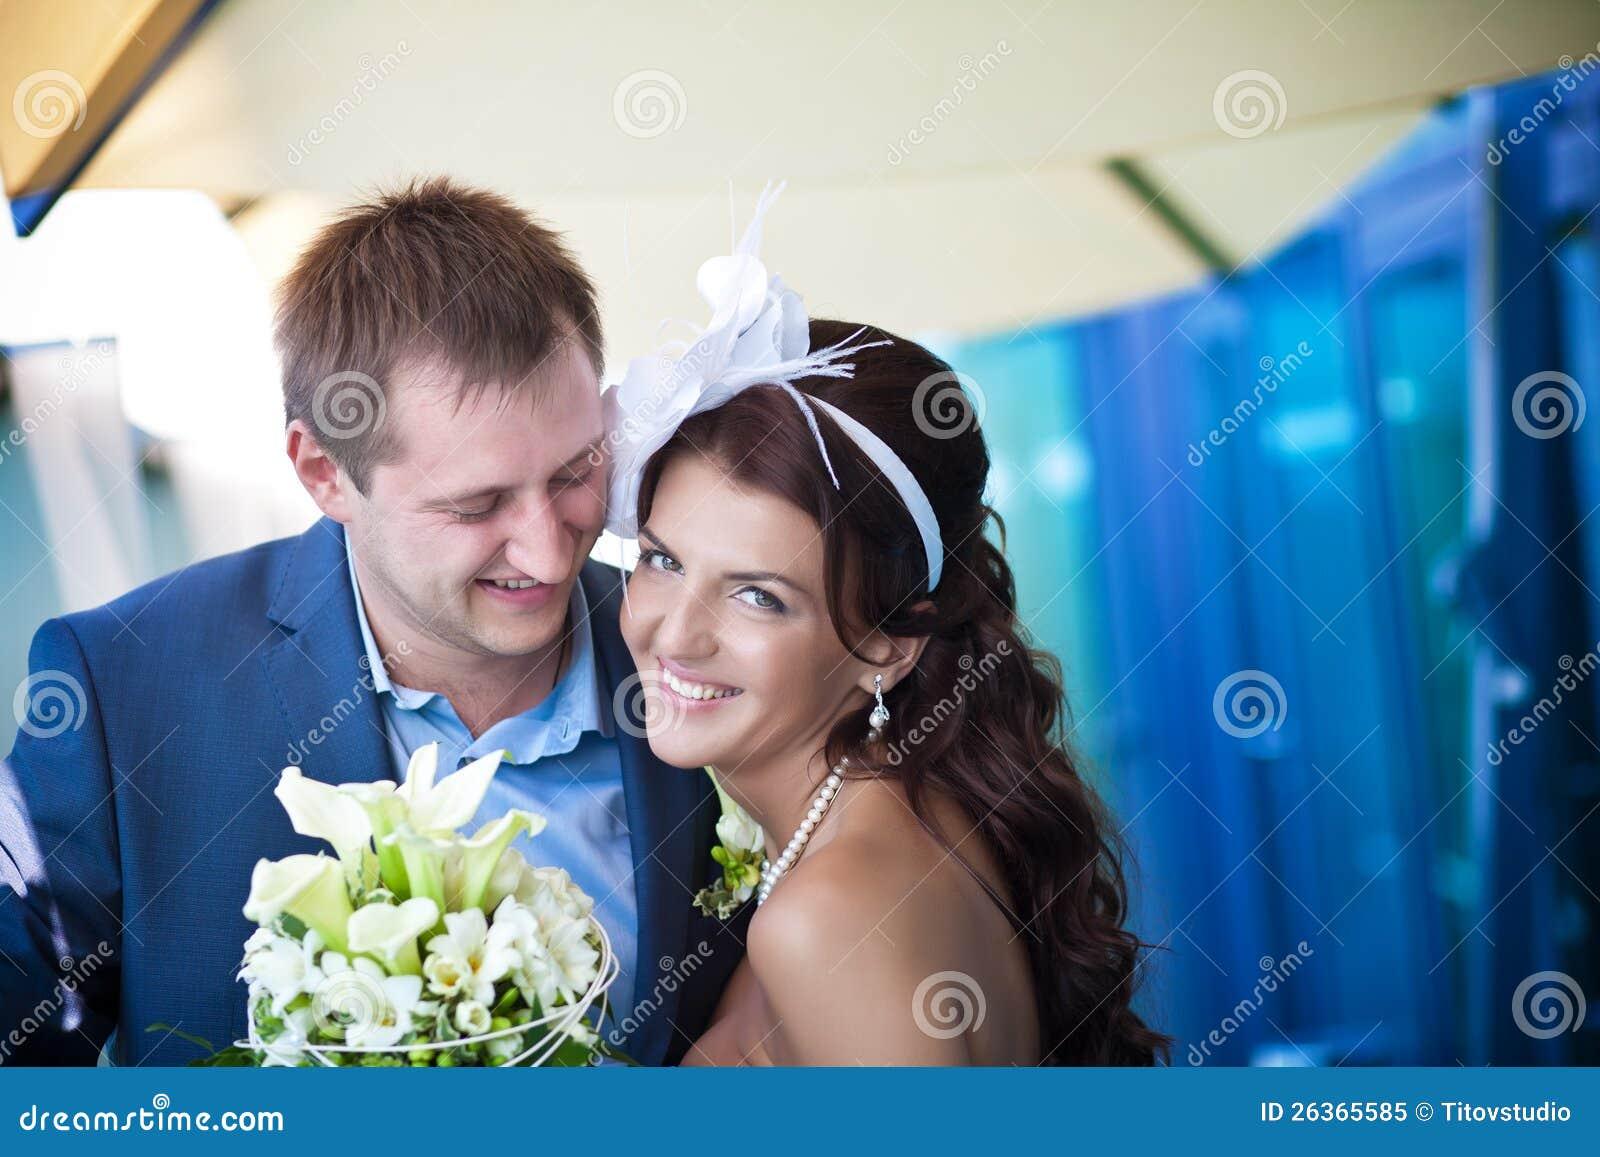 Braut und Bräutigam lacht nahe dem Glas